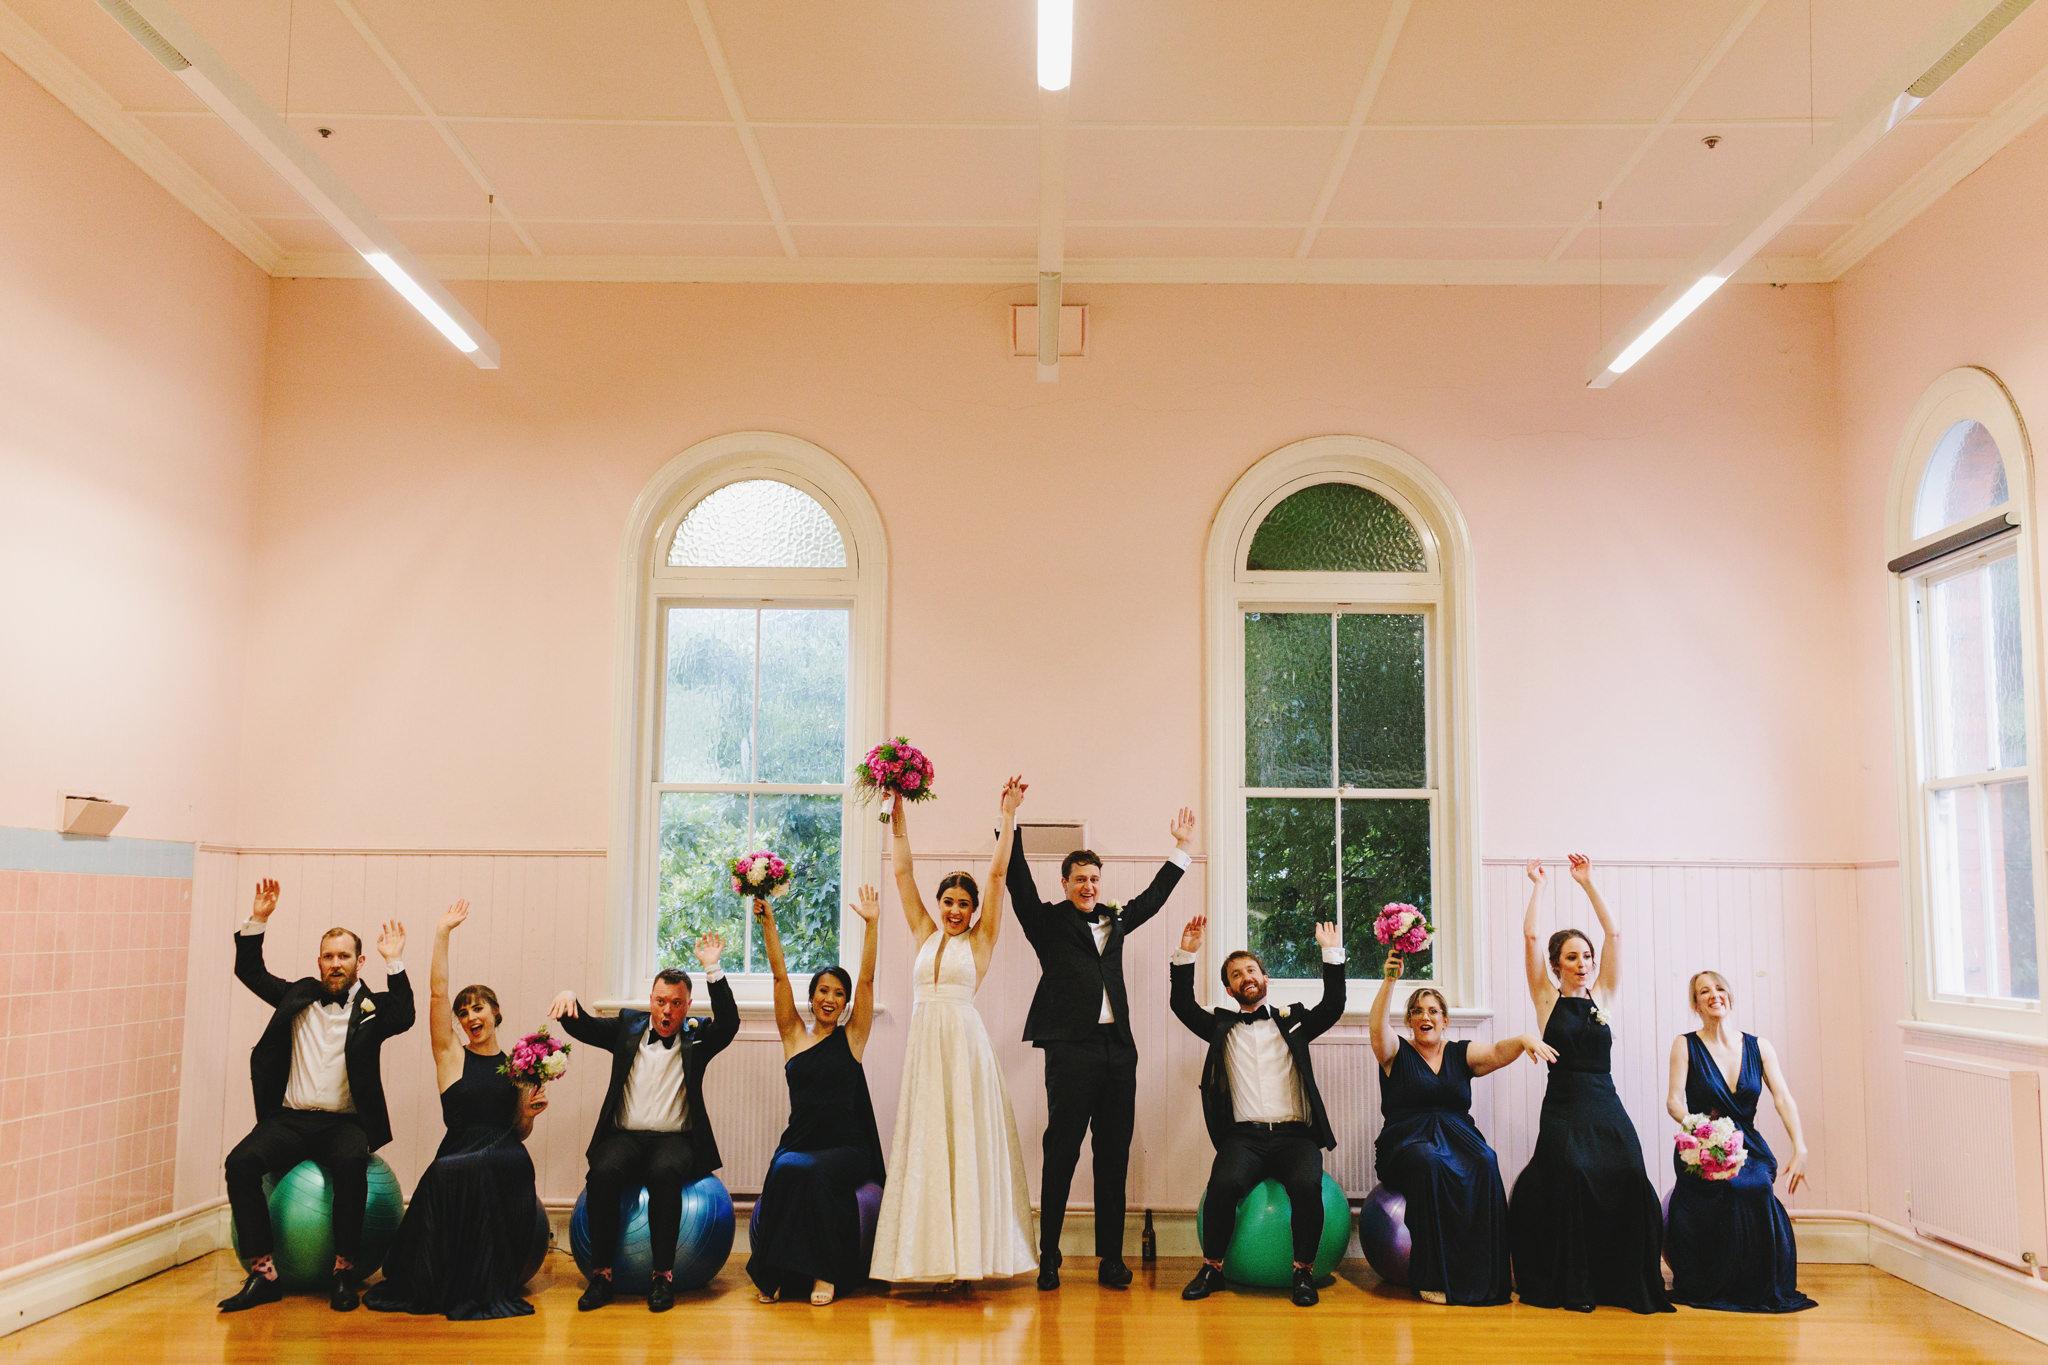 Abbotsford_Convent_Wedding_Peter_Anna085.JPG